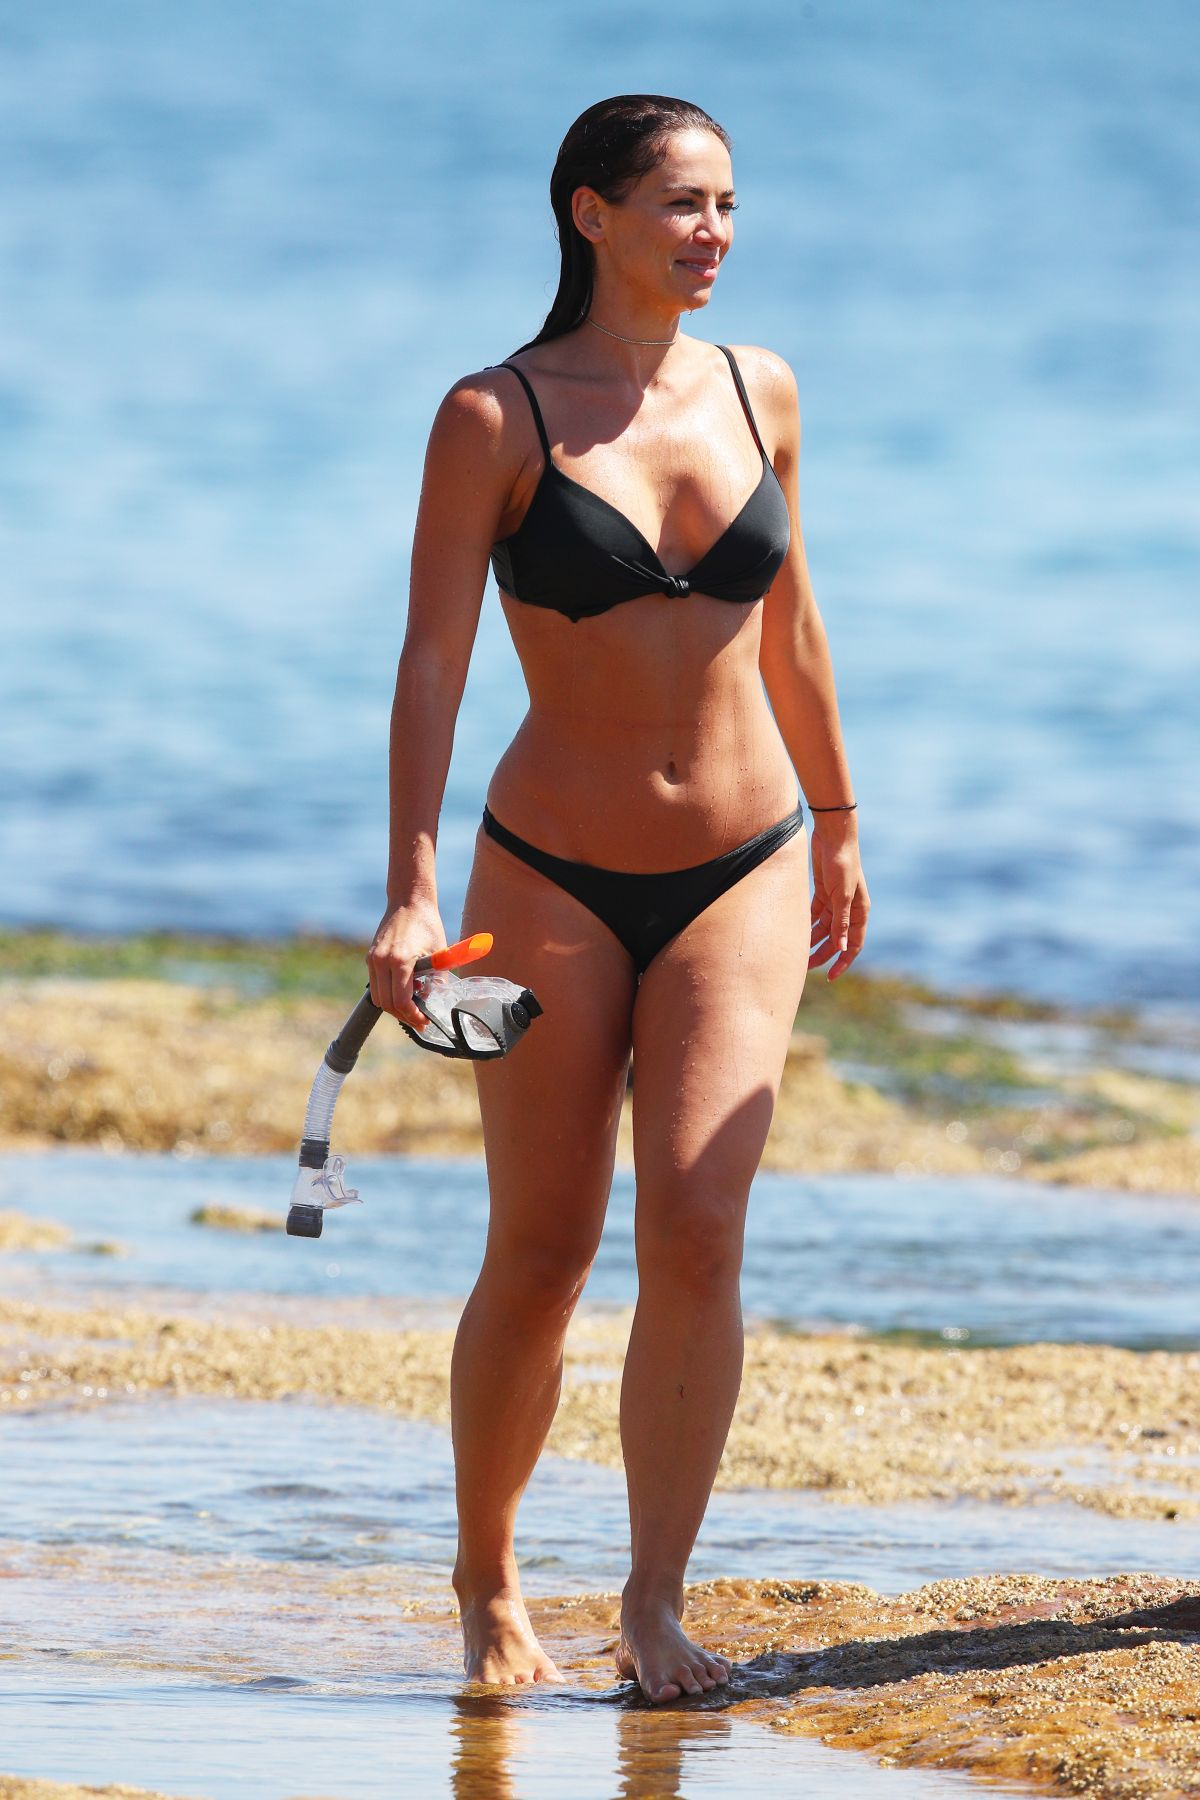 Bikini Emma King nude (59 foto and video), Ass, Hot, Boobs, bra 2020